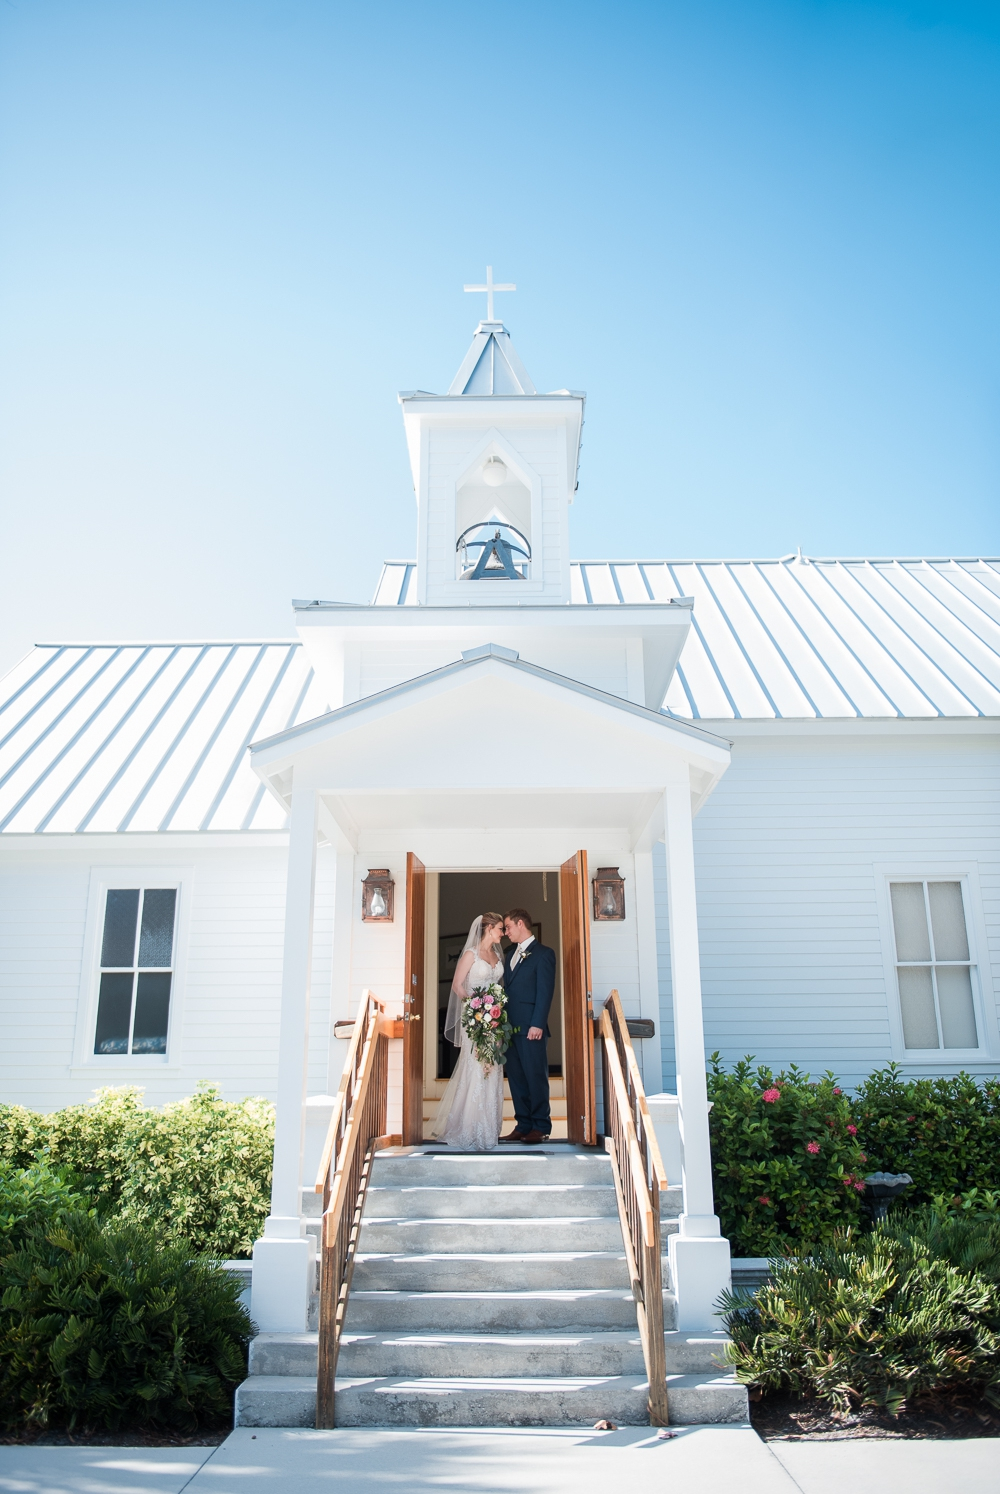 2016 HLM Wedding Beach Shoot 1.jpg